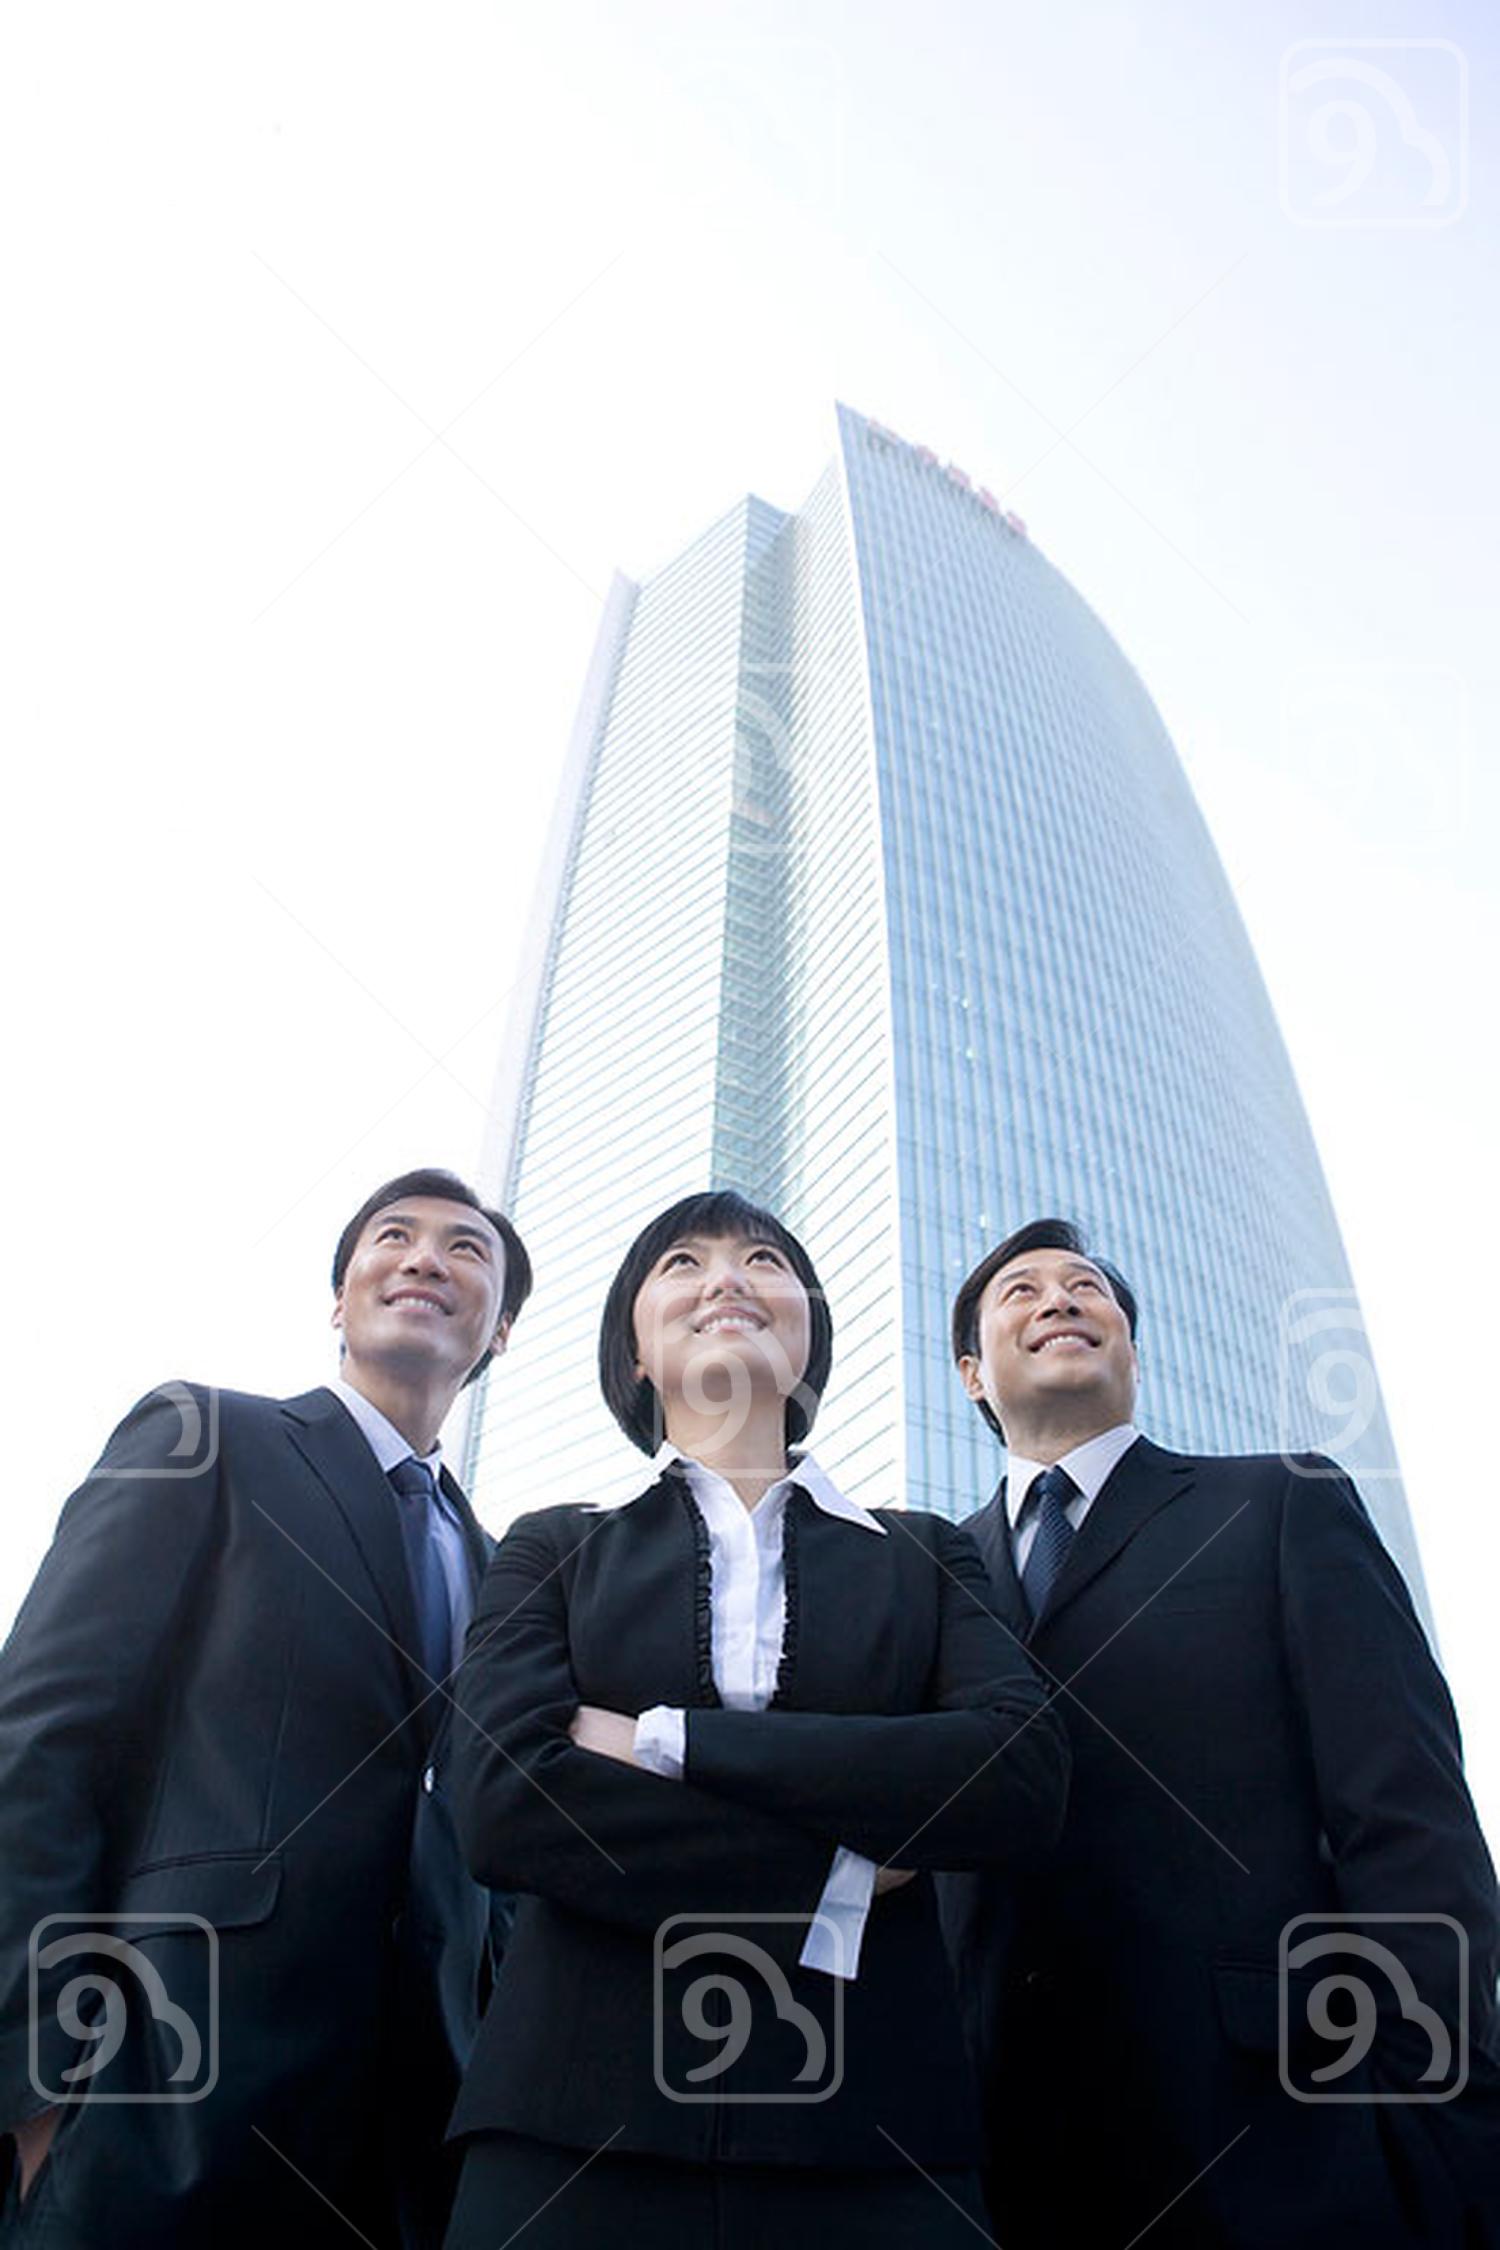 Management level business team